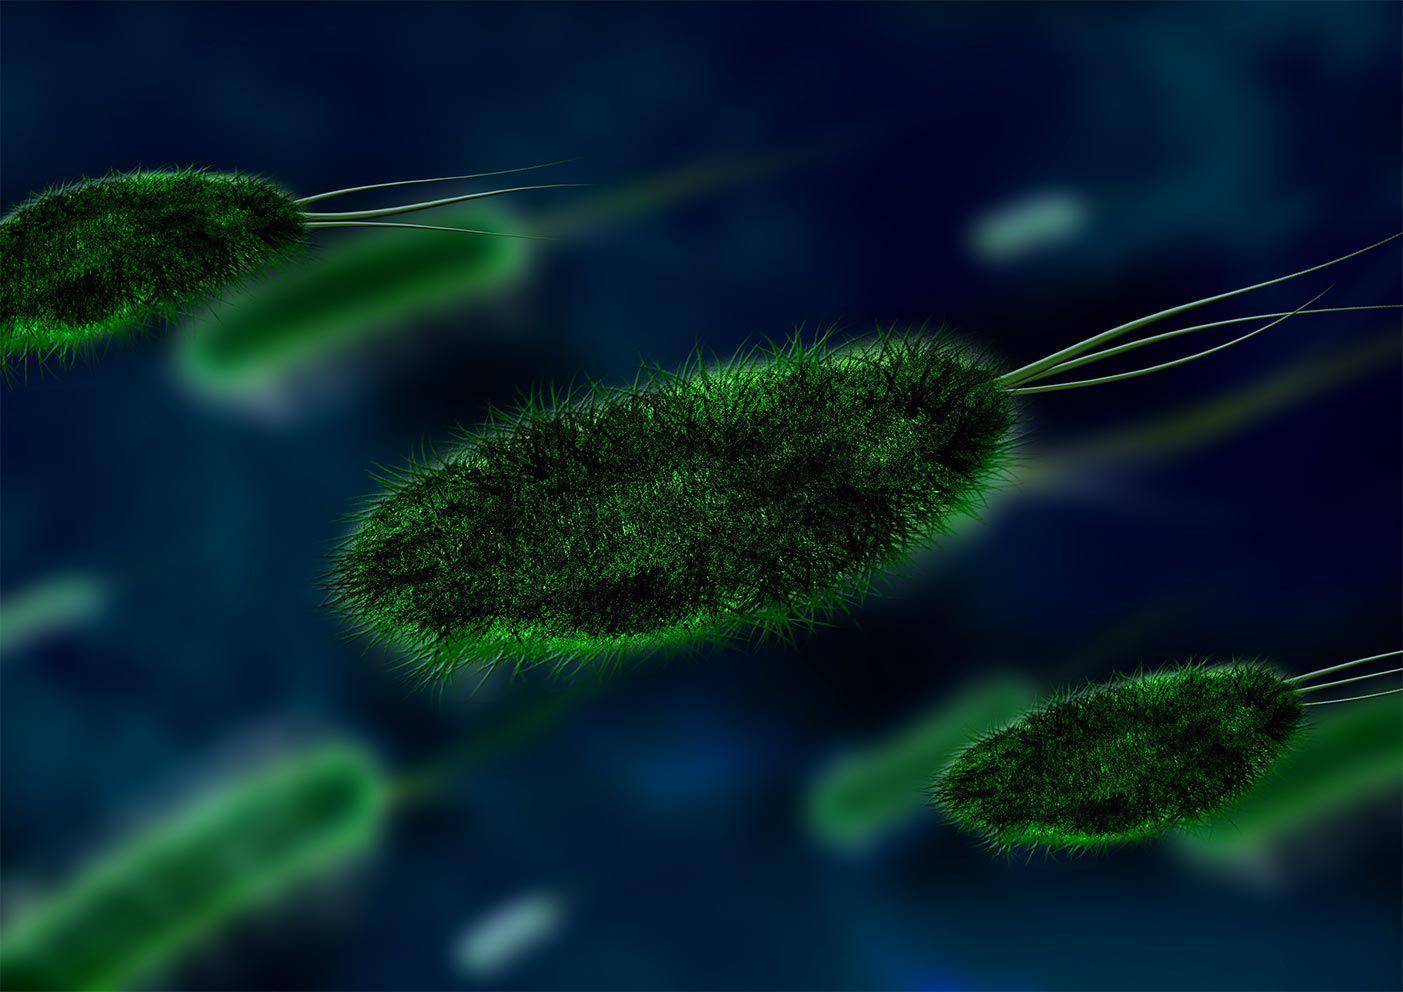 3D rendering of E. coli